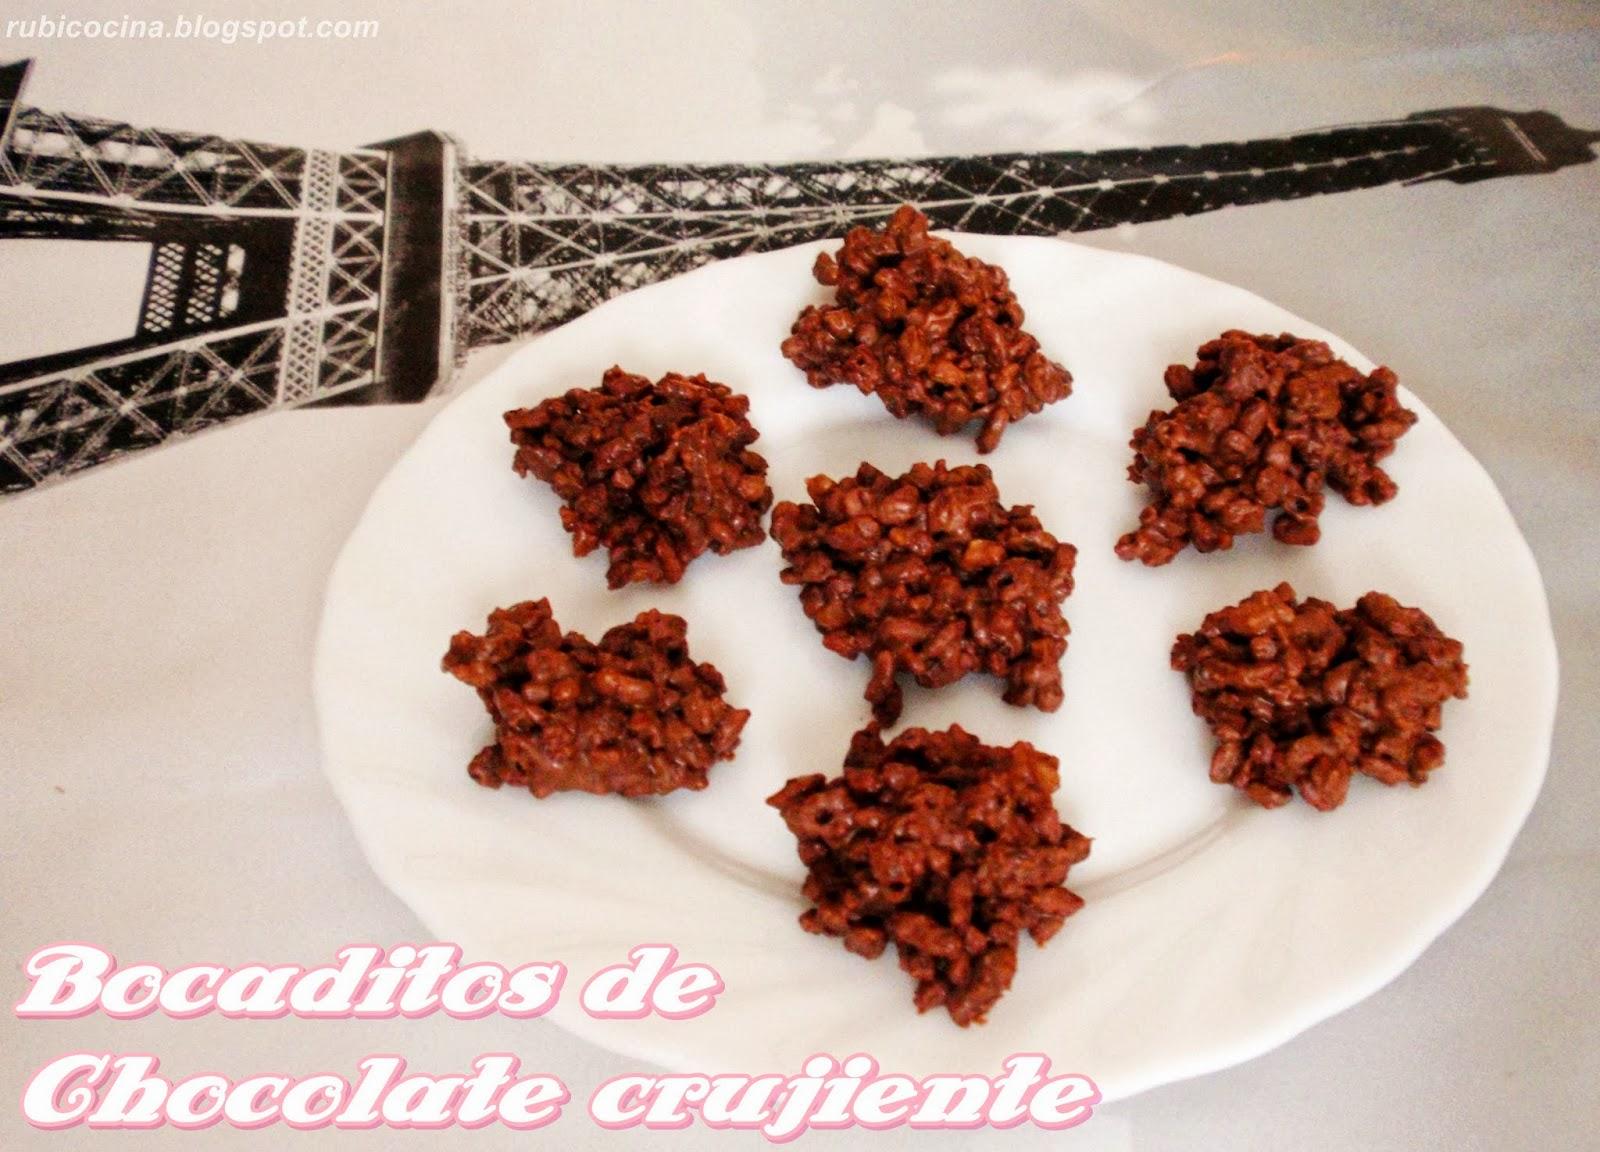 rubibeauty receta bocaditos chocolate crujiente san valentin dulce